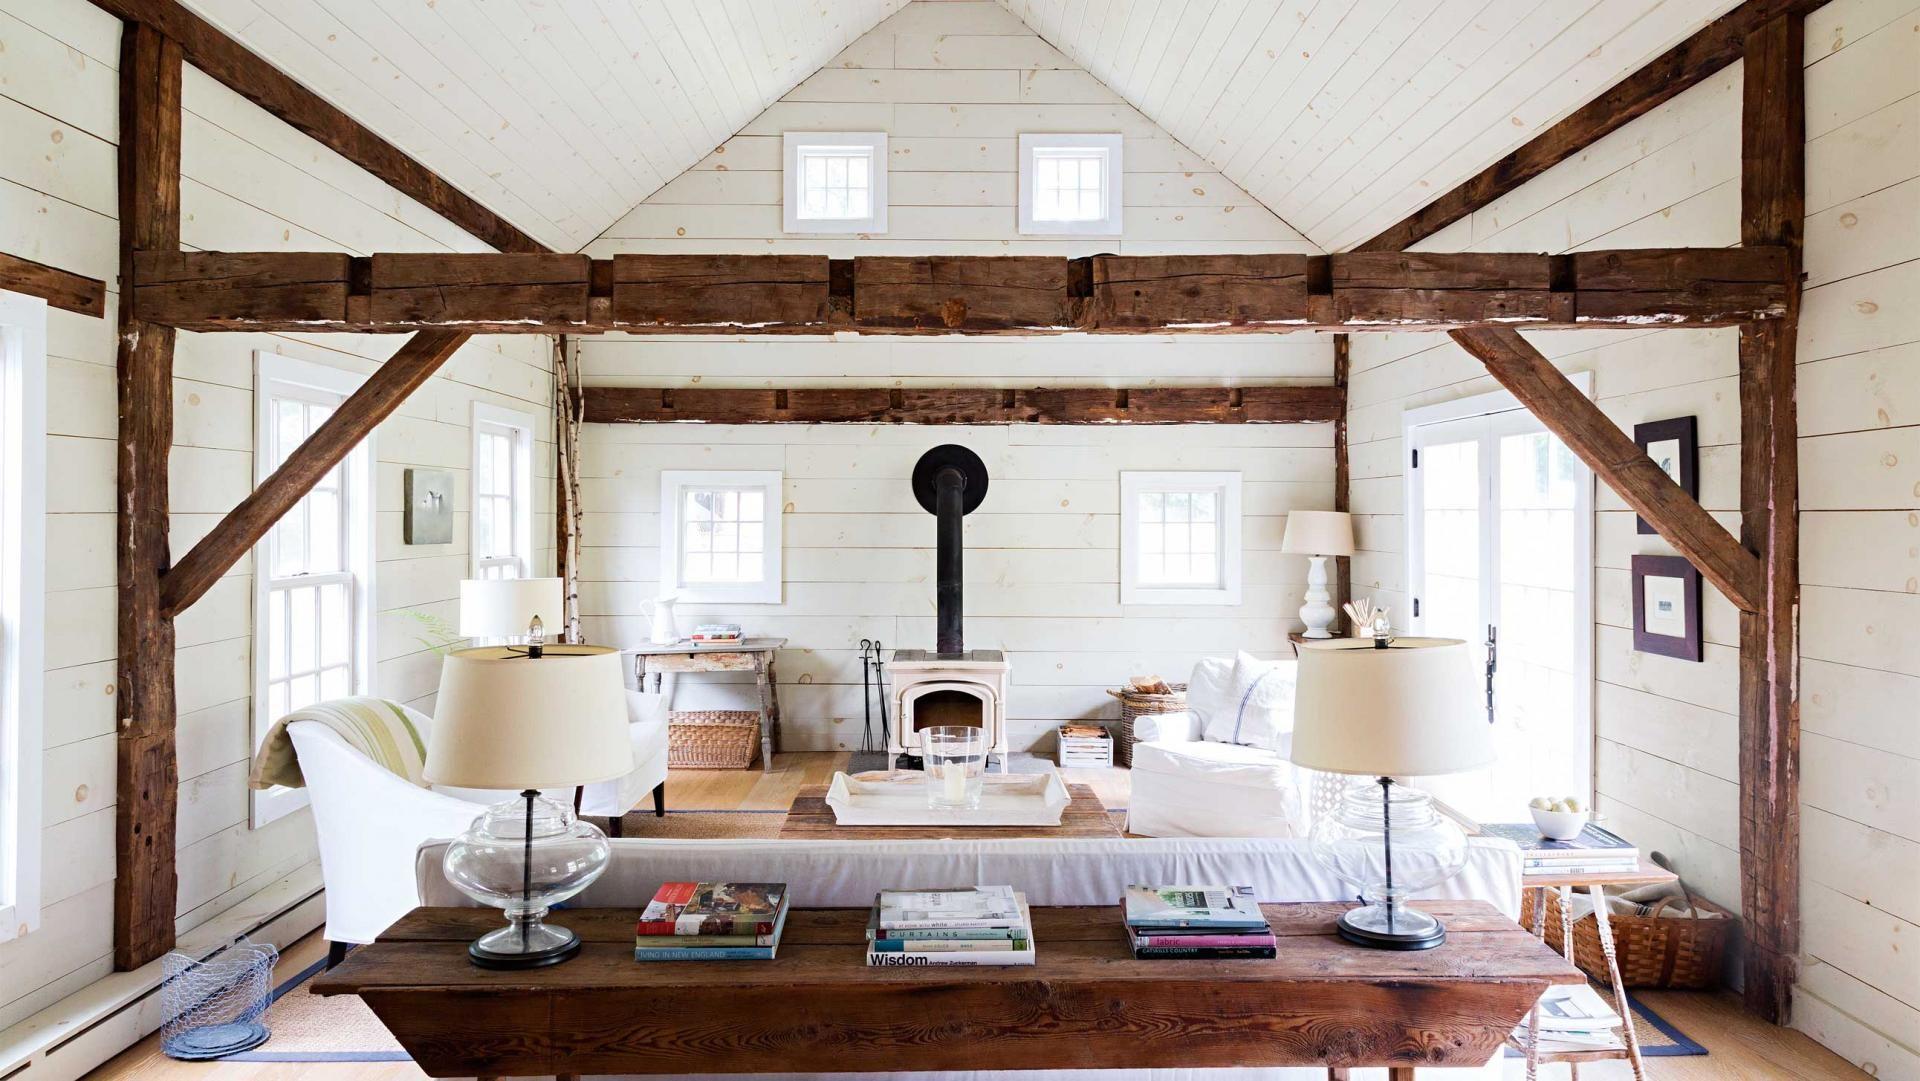 rustic living room | Rustic Curation | Pinterest | Living rooms ...